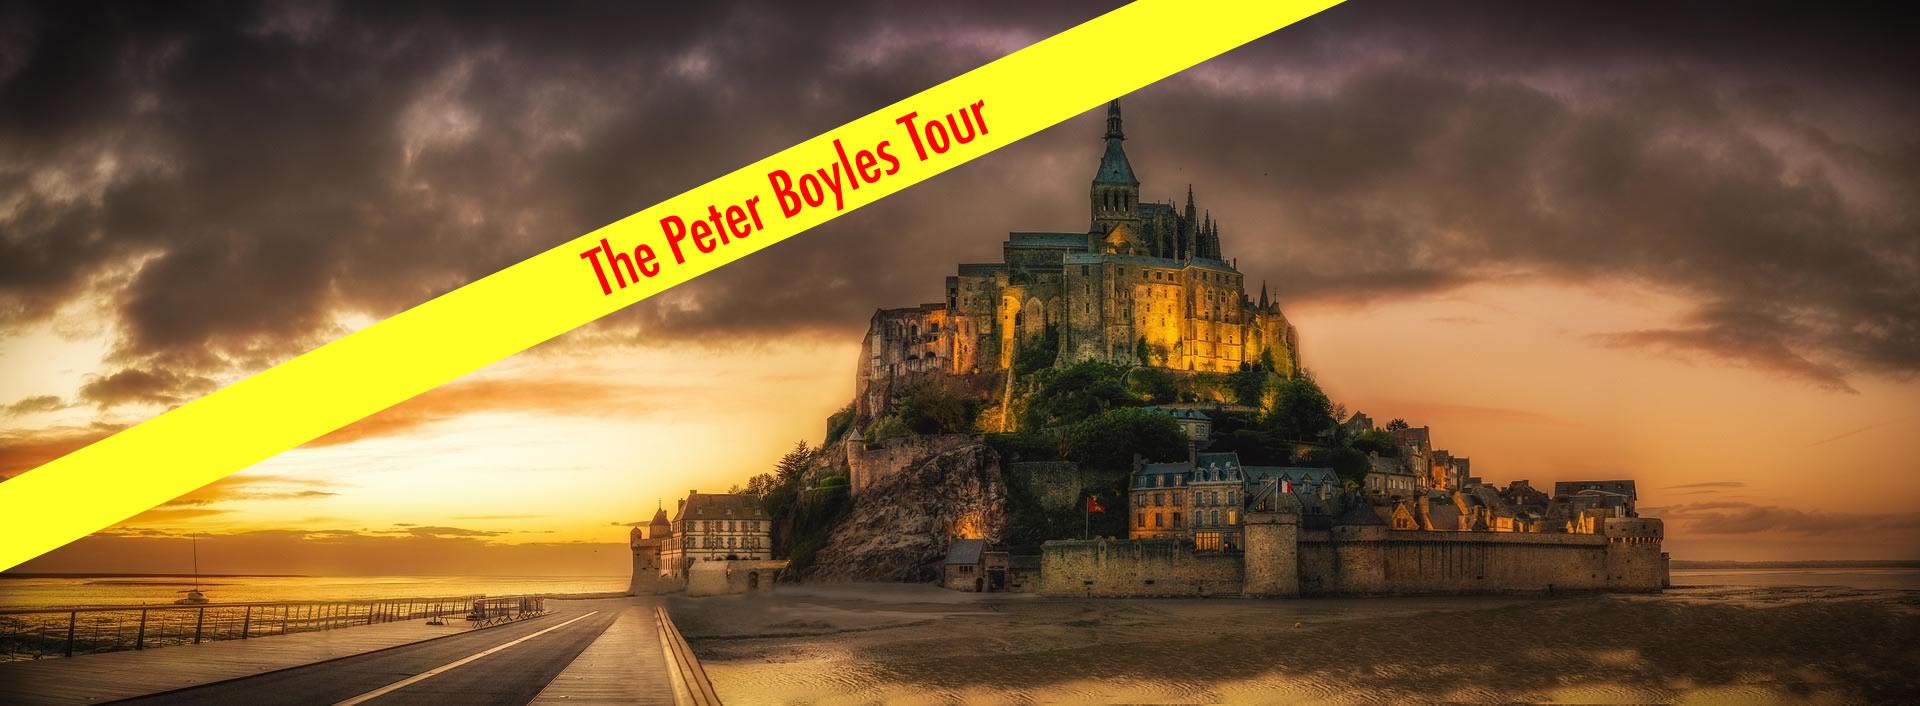 Look Where Peter Boyles is Headed